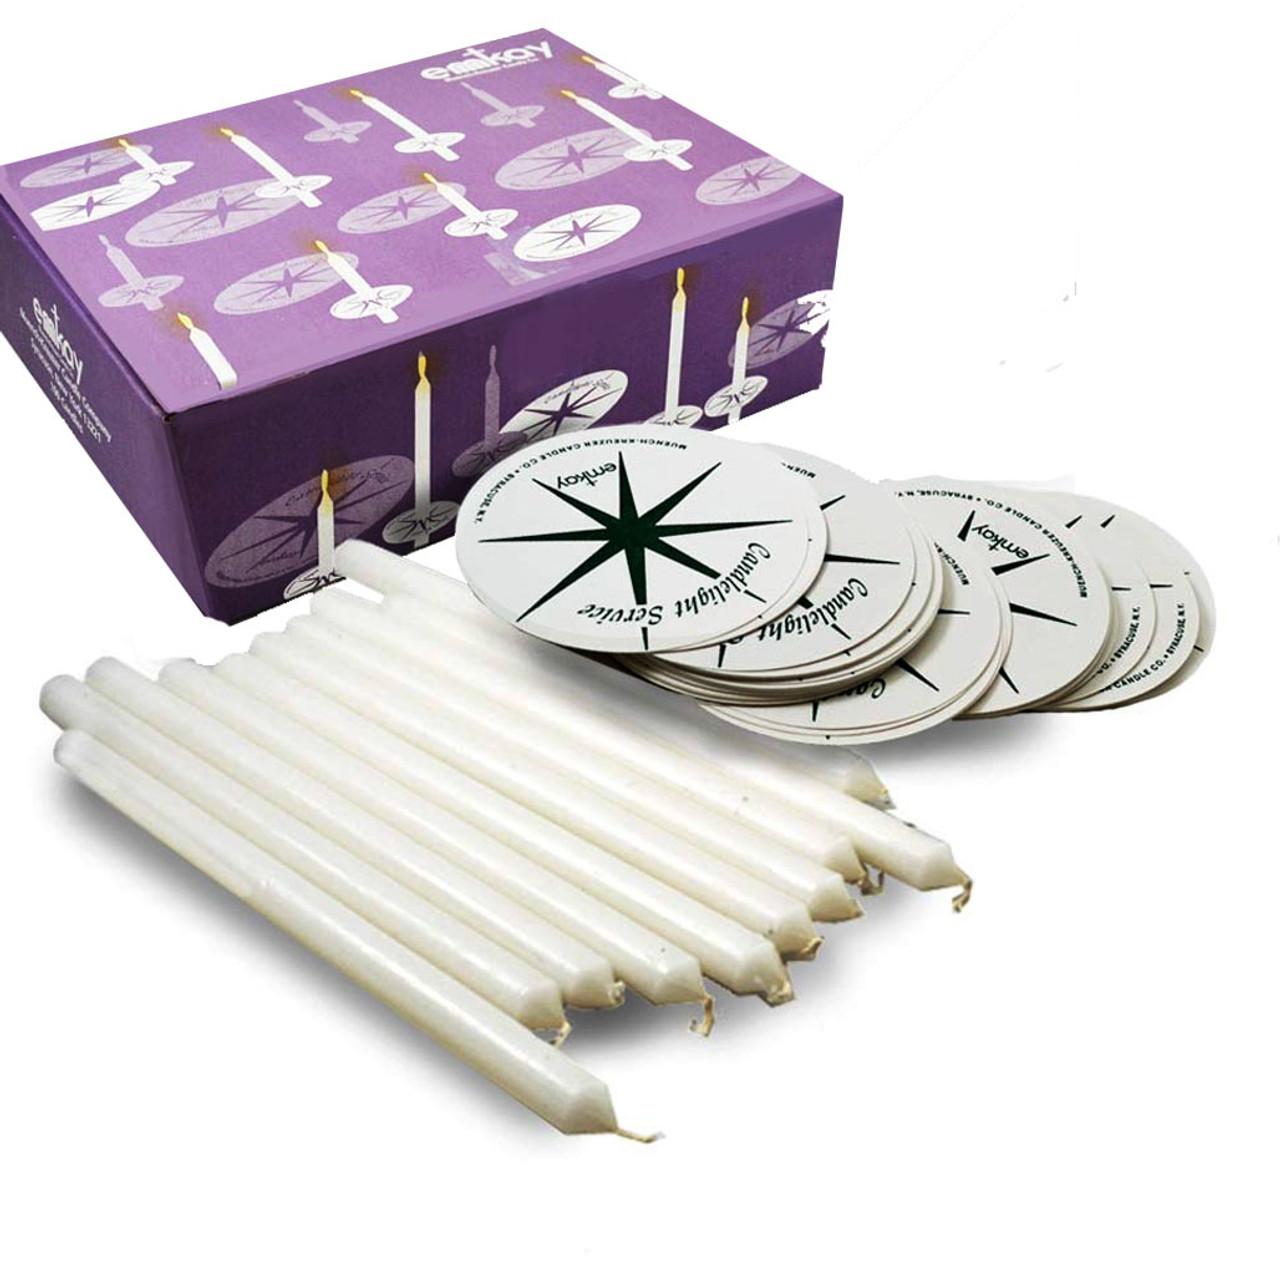 Lighting The Way Kit/100 Candles -Drip Protectors